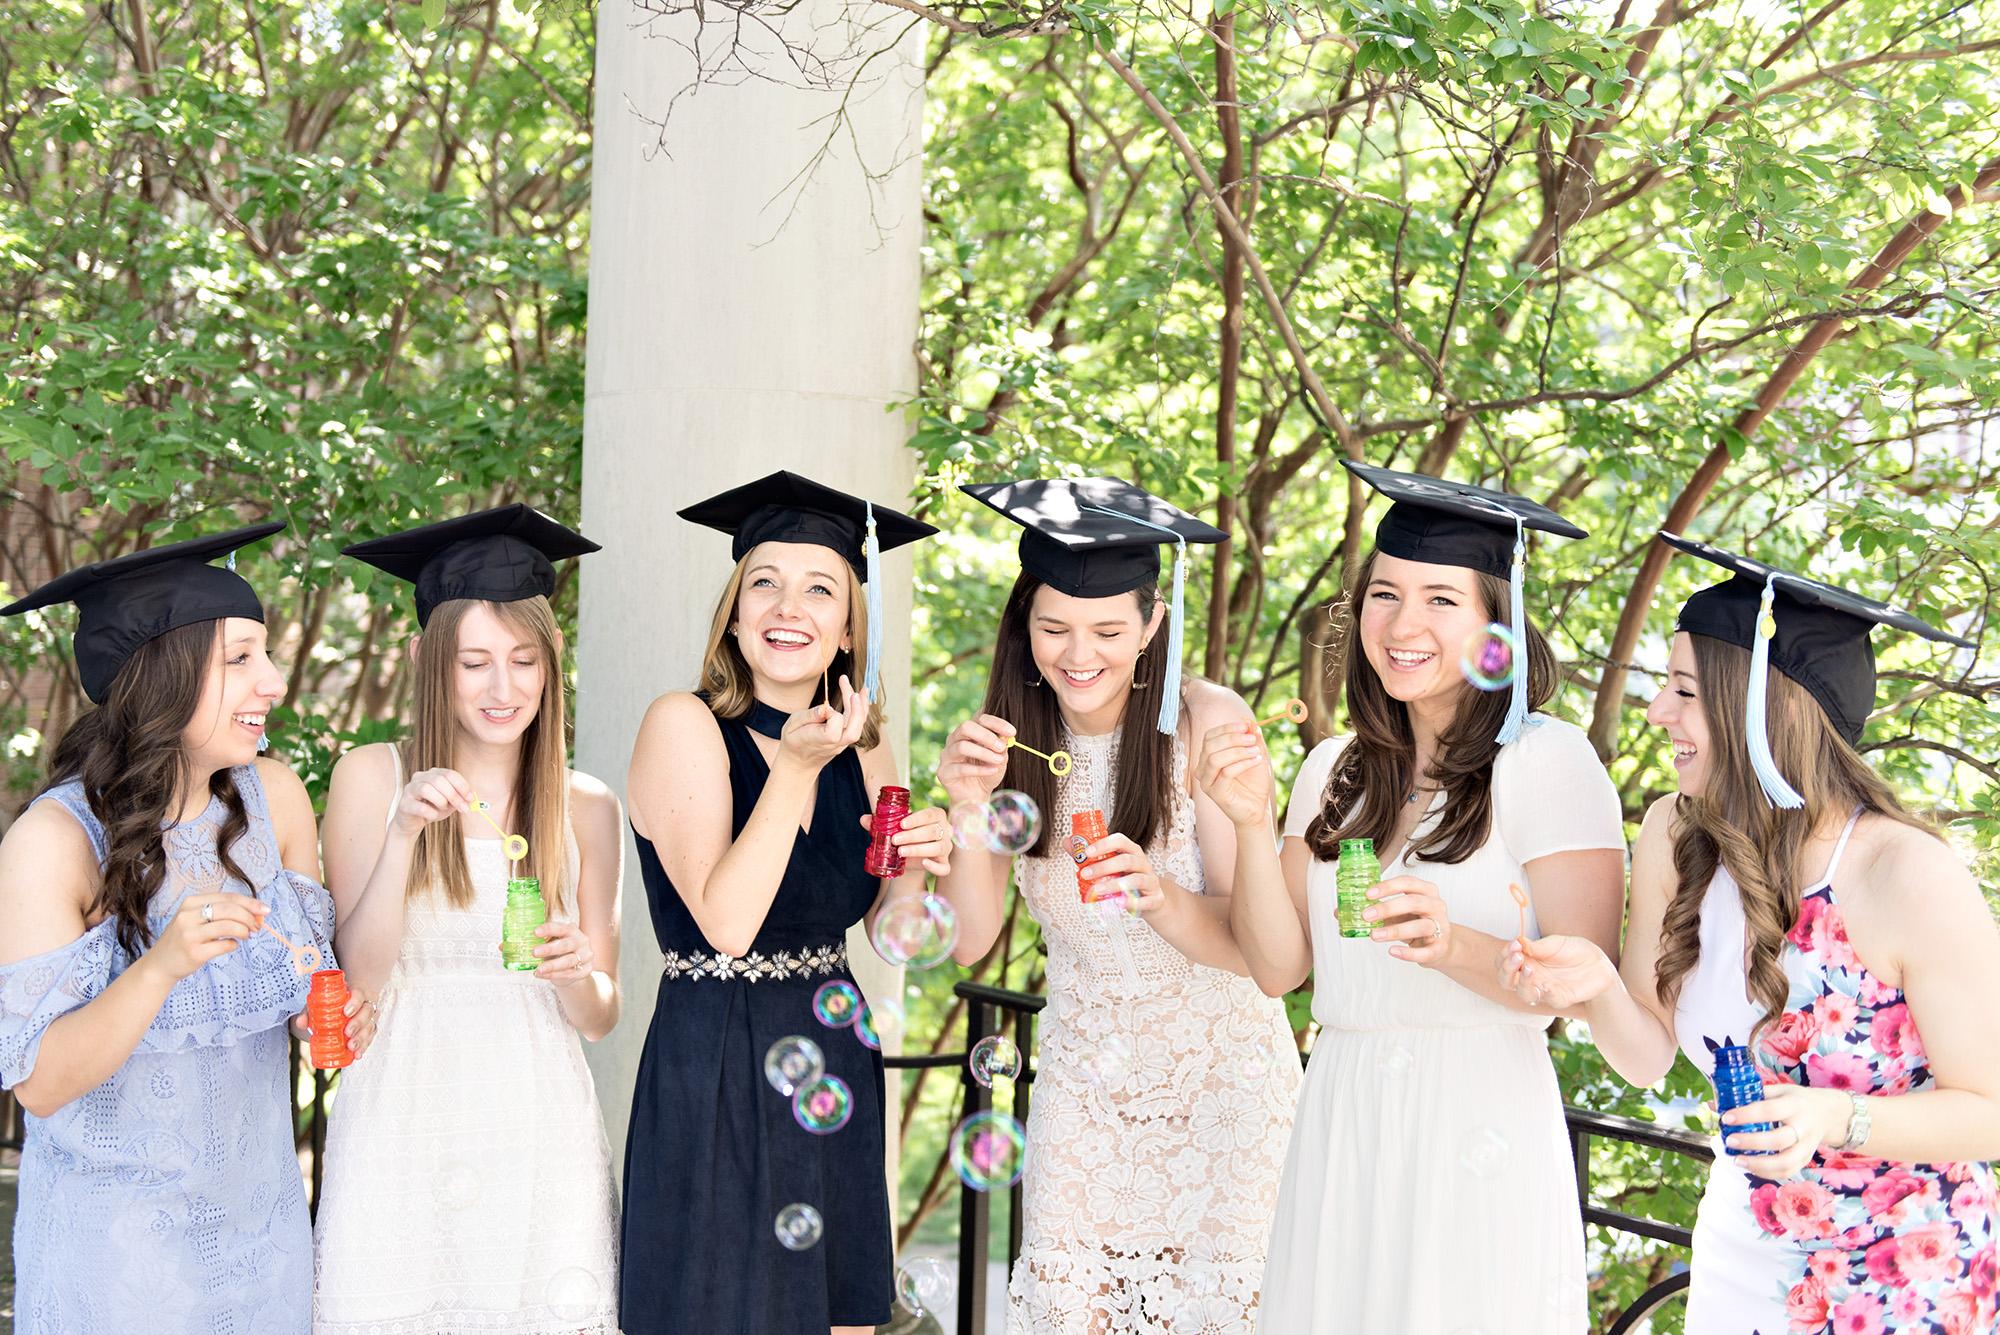 GraduationDay_38 copy.jpg